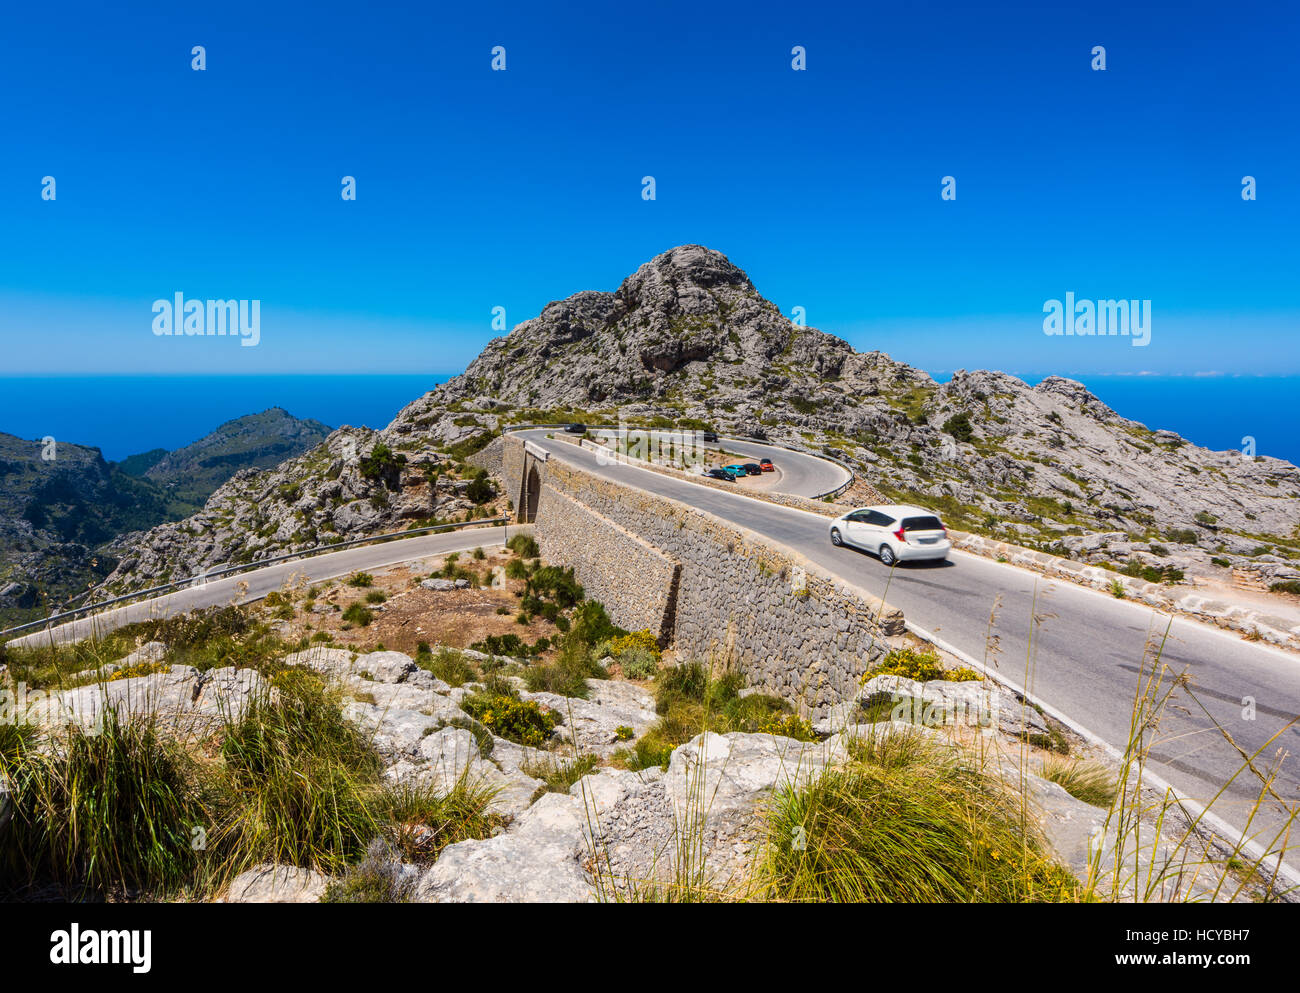 Spiral bridge on the road to Sa Calobra Mallorca - Stock Image